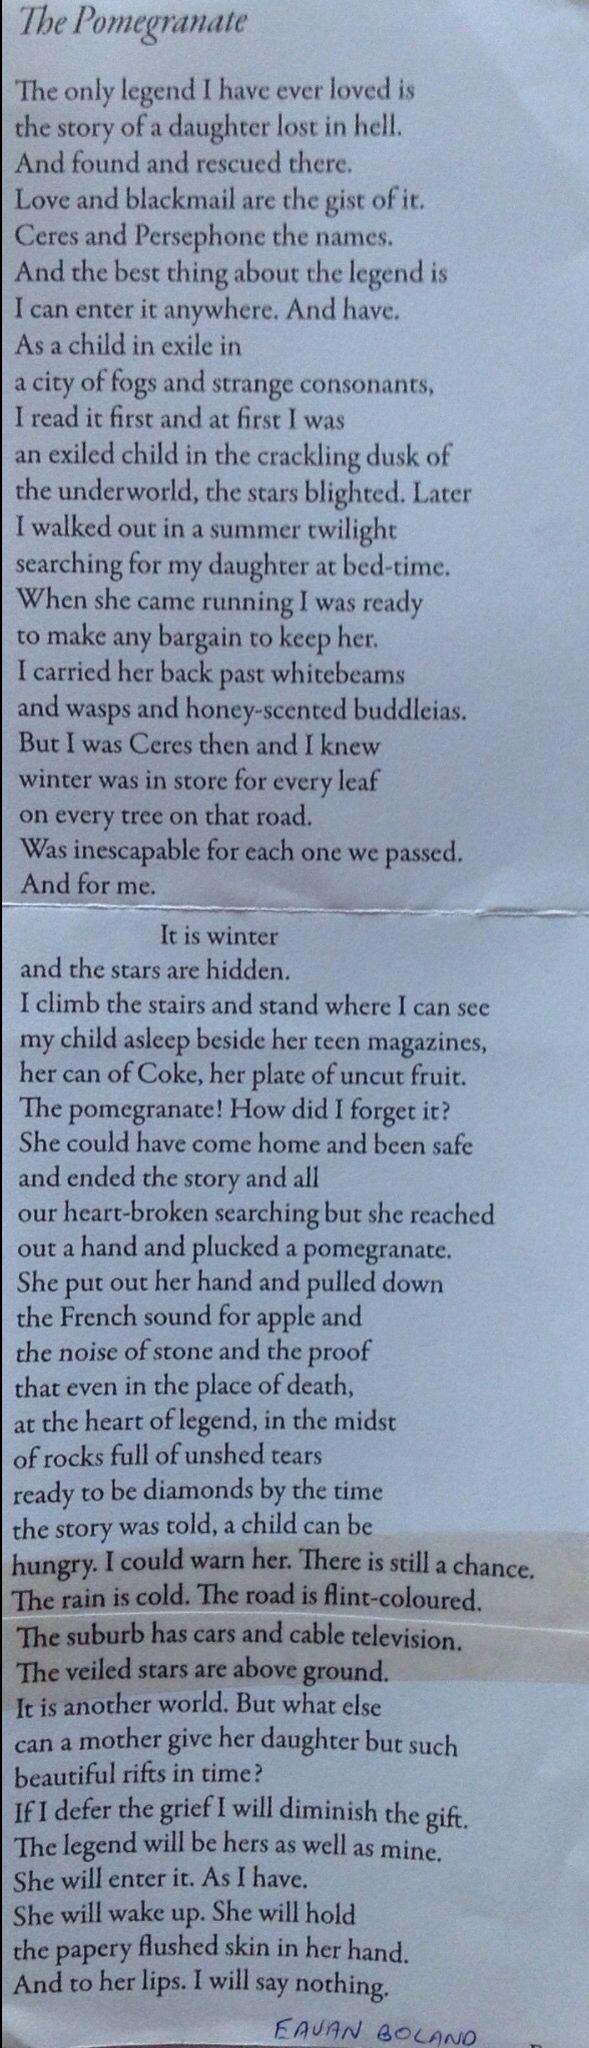 Eavan Boland poem, The Pomegranate, based on the Persephone/Demeter myth.